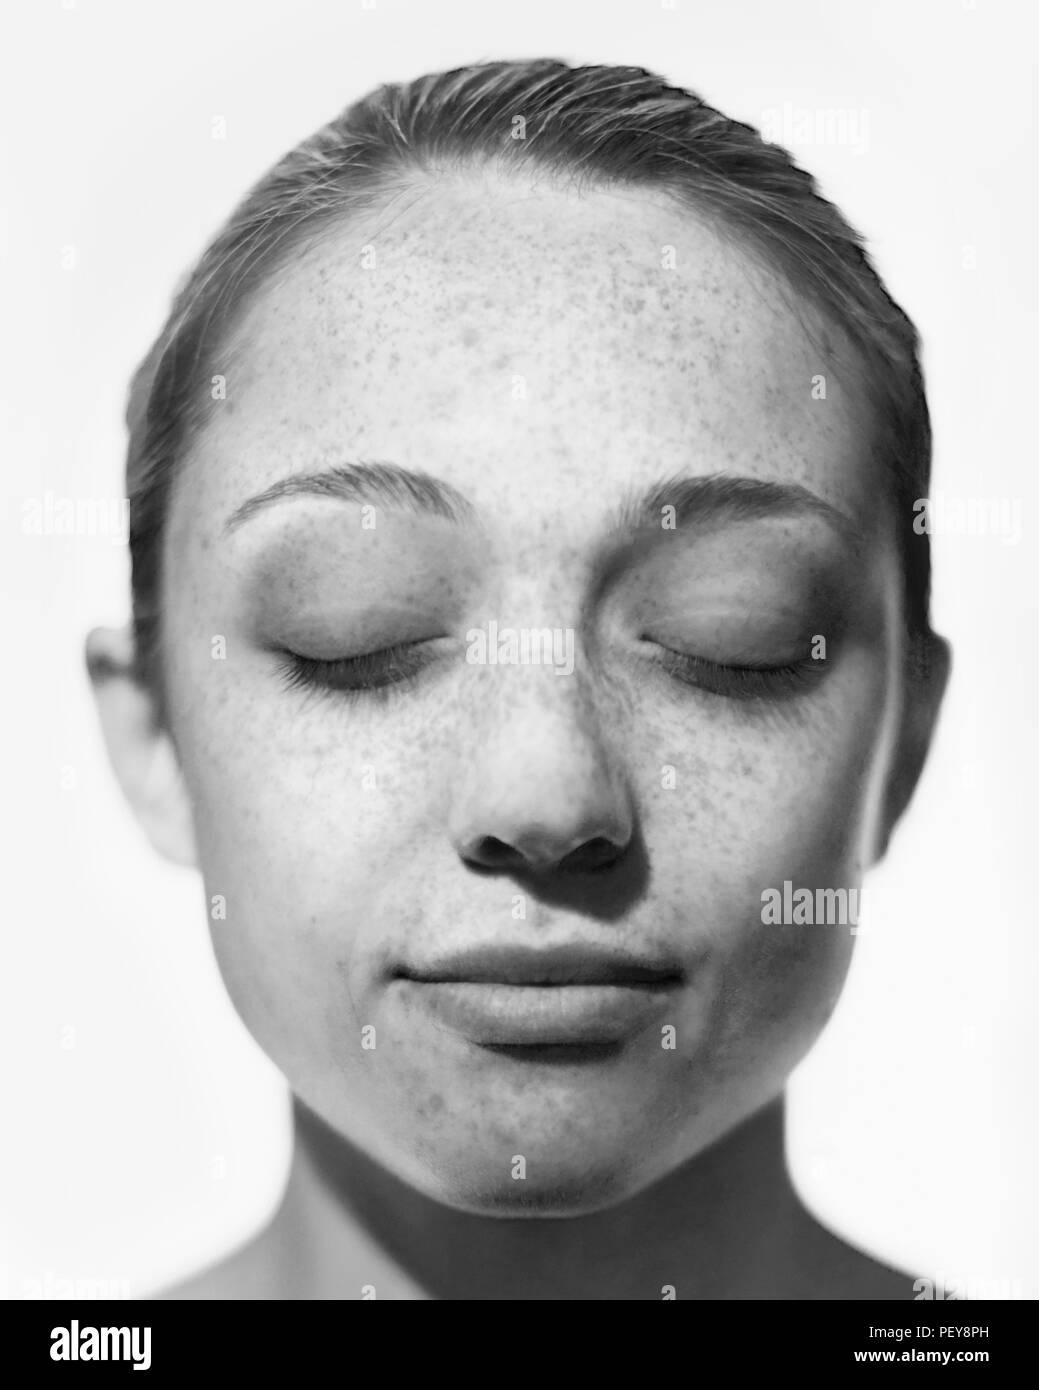 Sun damage on woman's face. - Stock Image